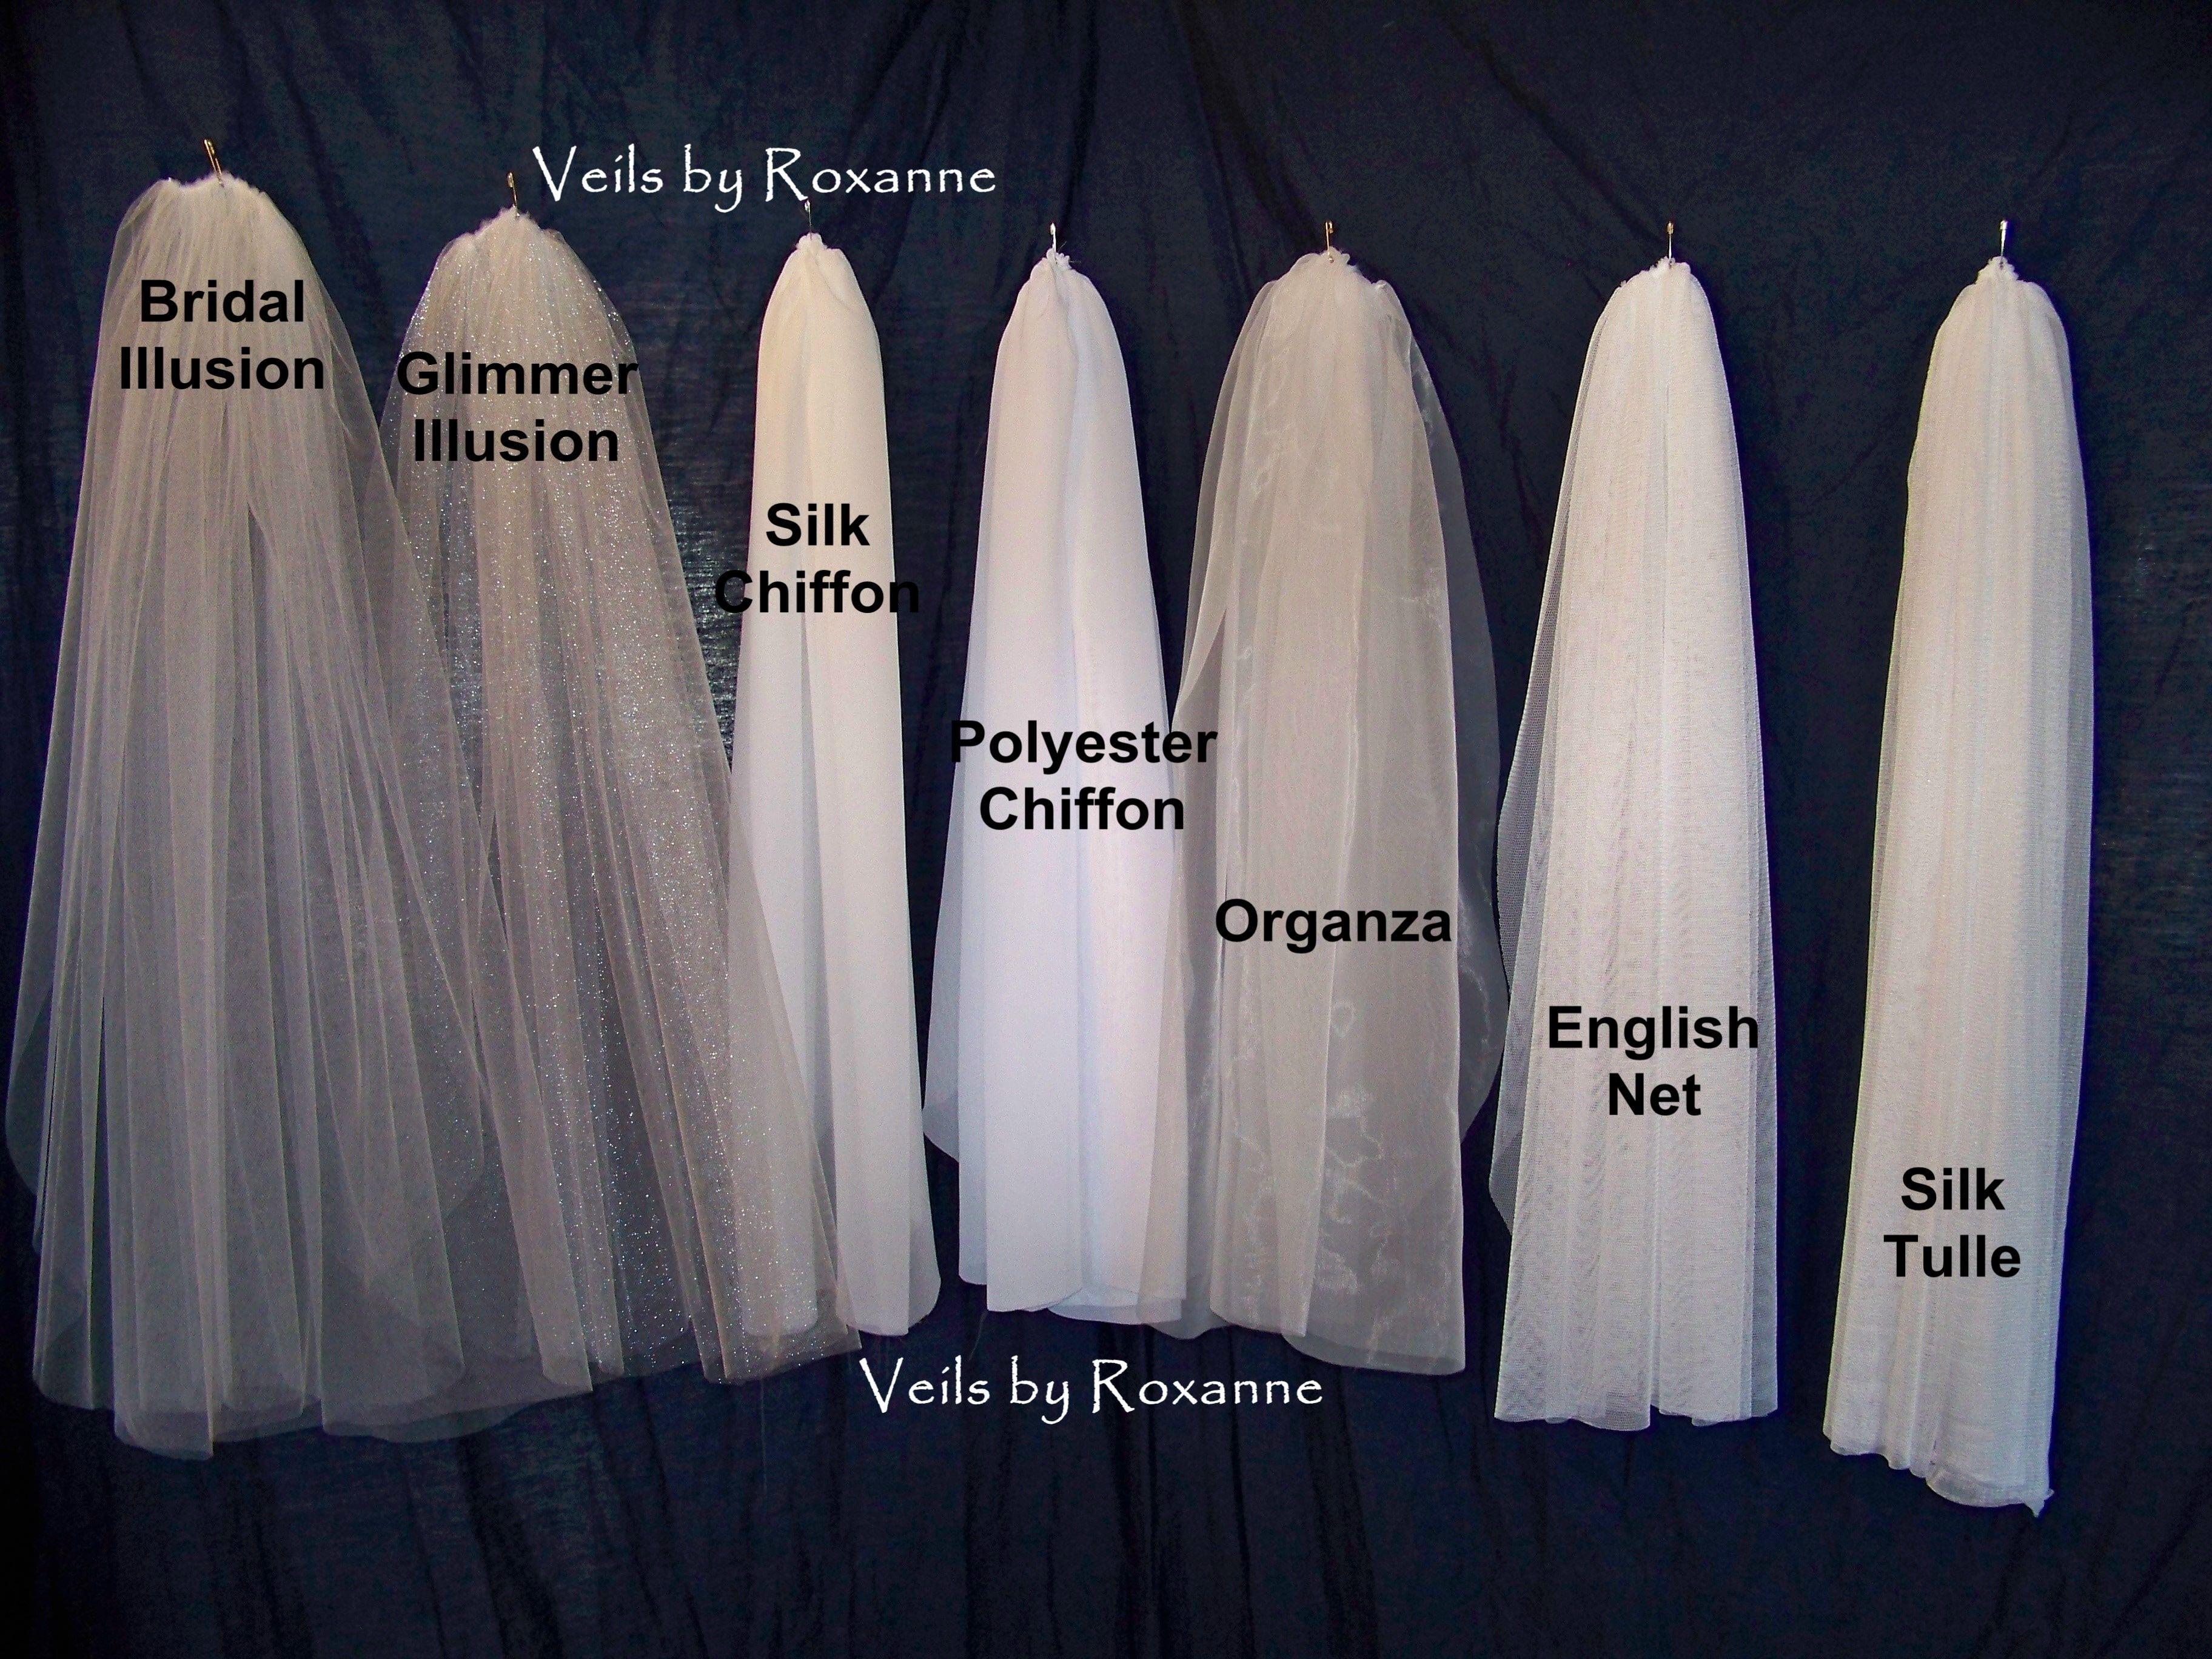 How to make a bridal veil simple diy bridal veil veil how to make a bridal veil simple diy bridal veil solutioingenieria Gallery